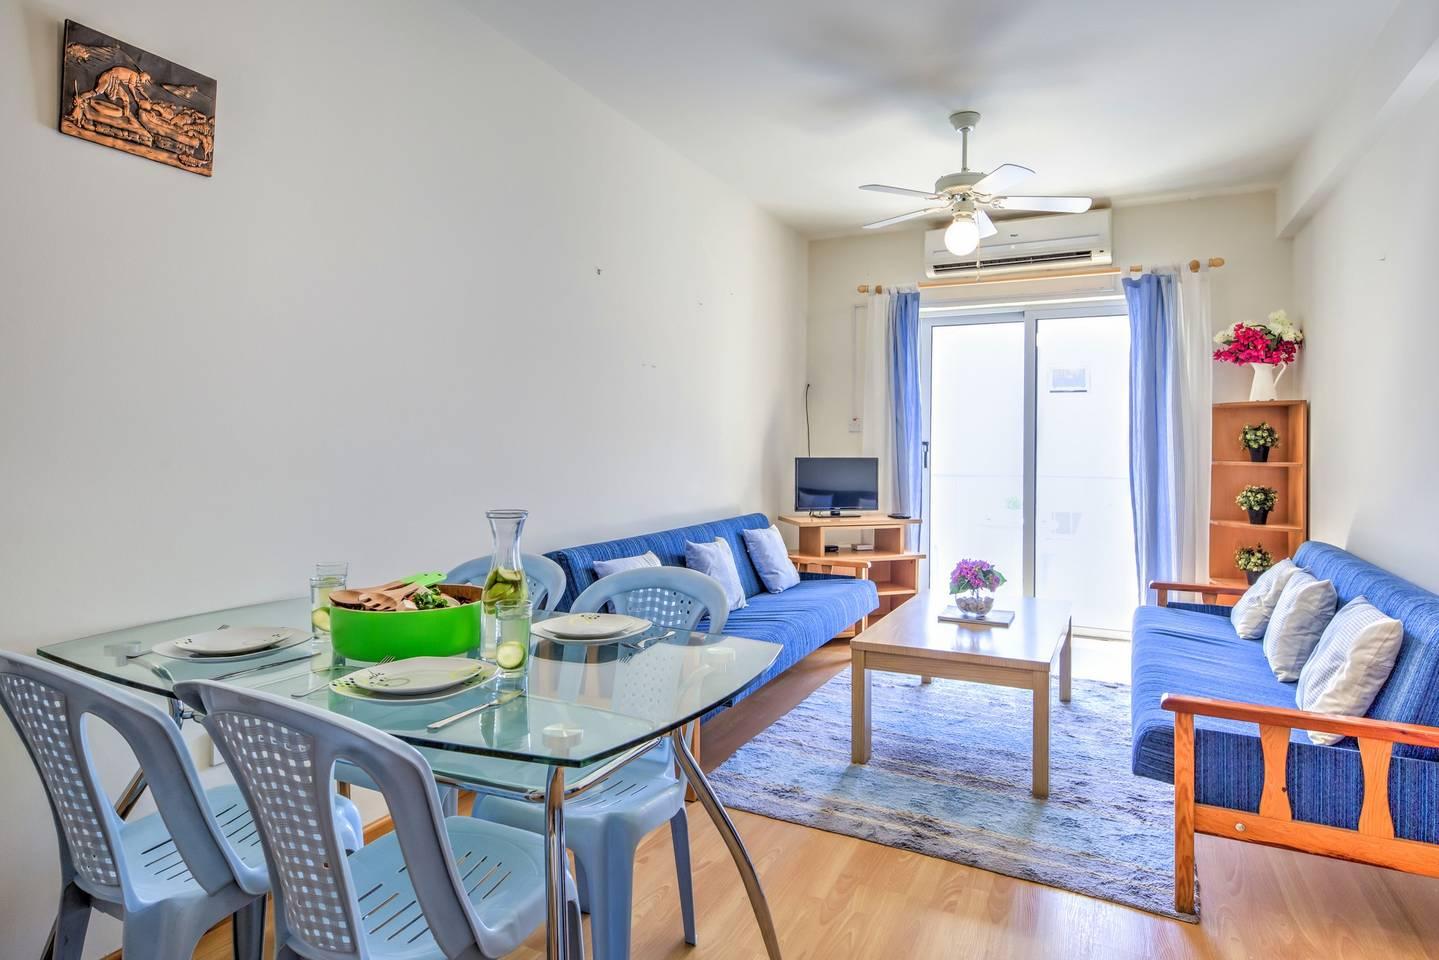 Apartment Large 2 Bedroom Apt - Ayia Napa Centre - ANDREA photo 25600630